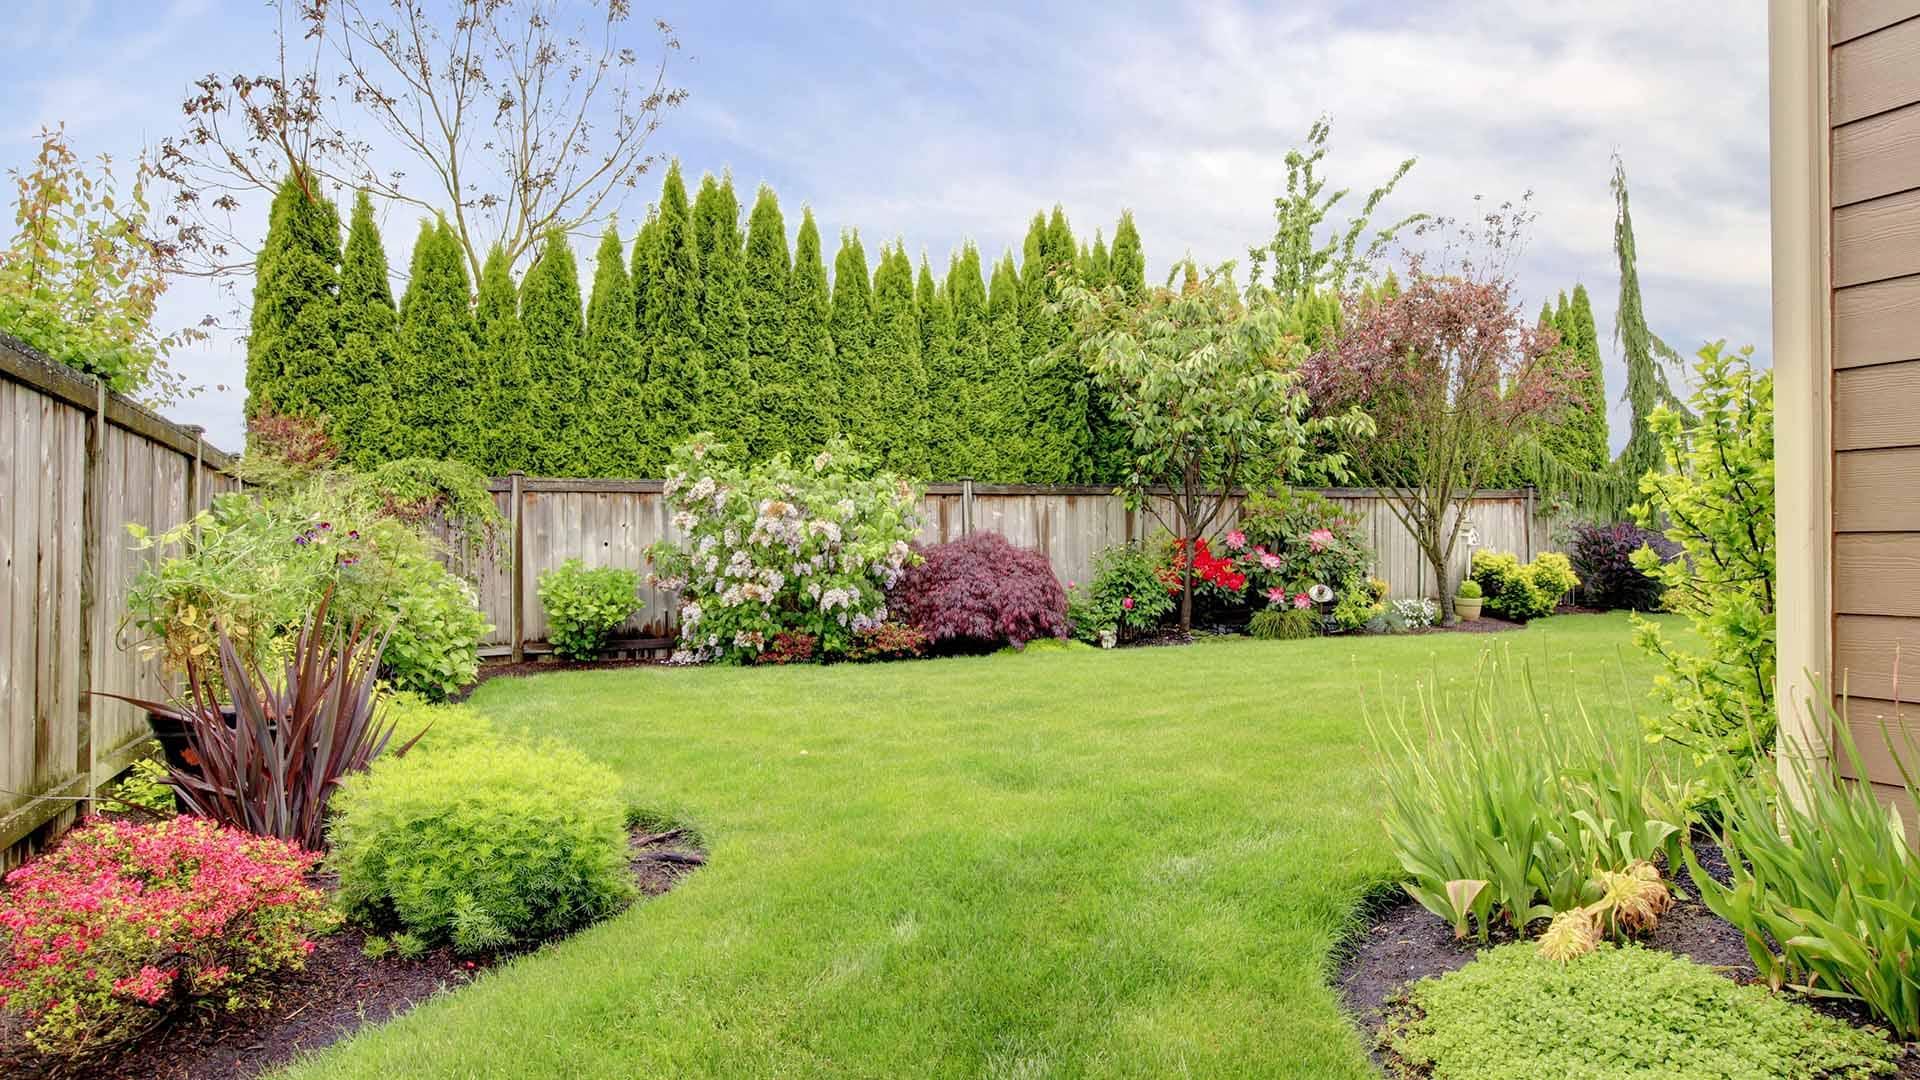 Plastino & Son Landscape Contractors Landscaping Company, Landscaper and Landscaping Services slide 3